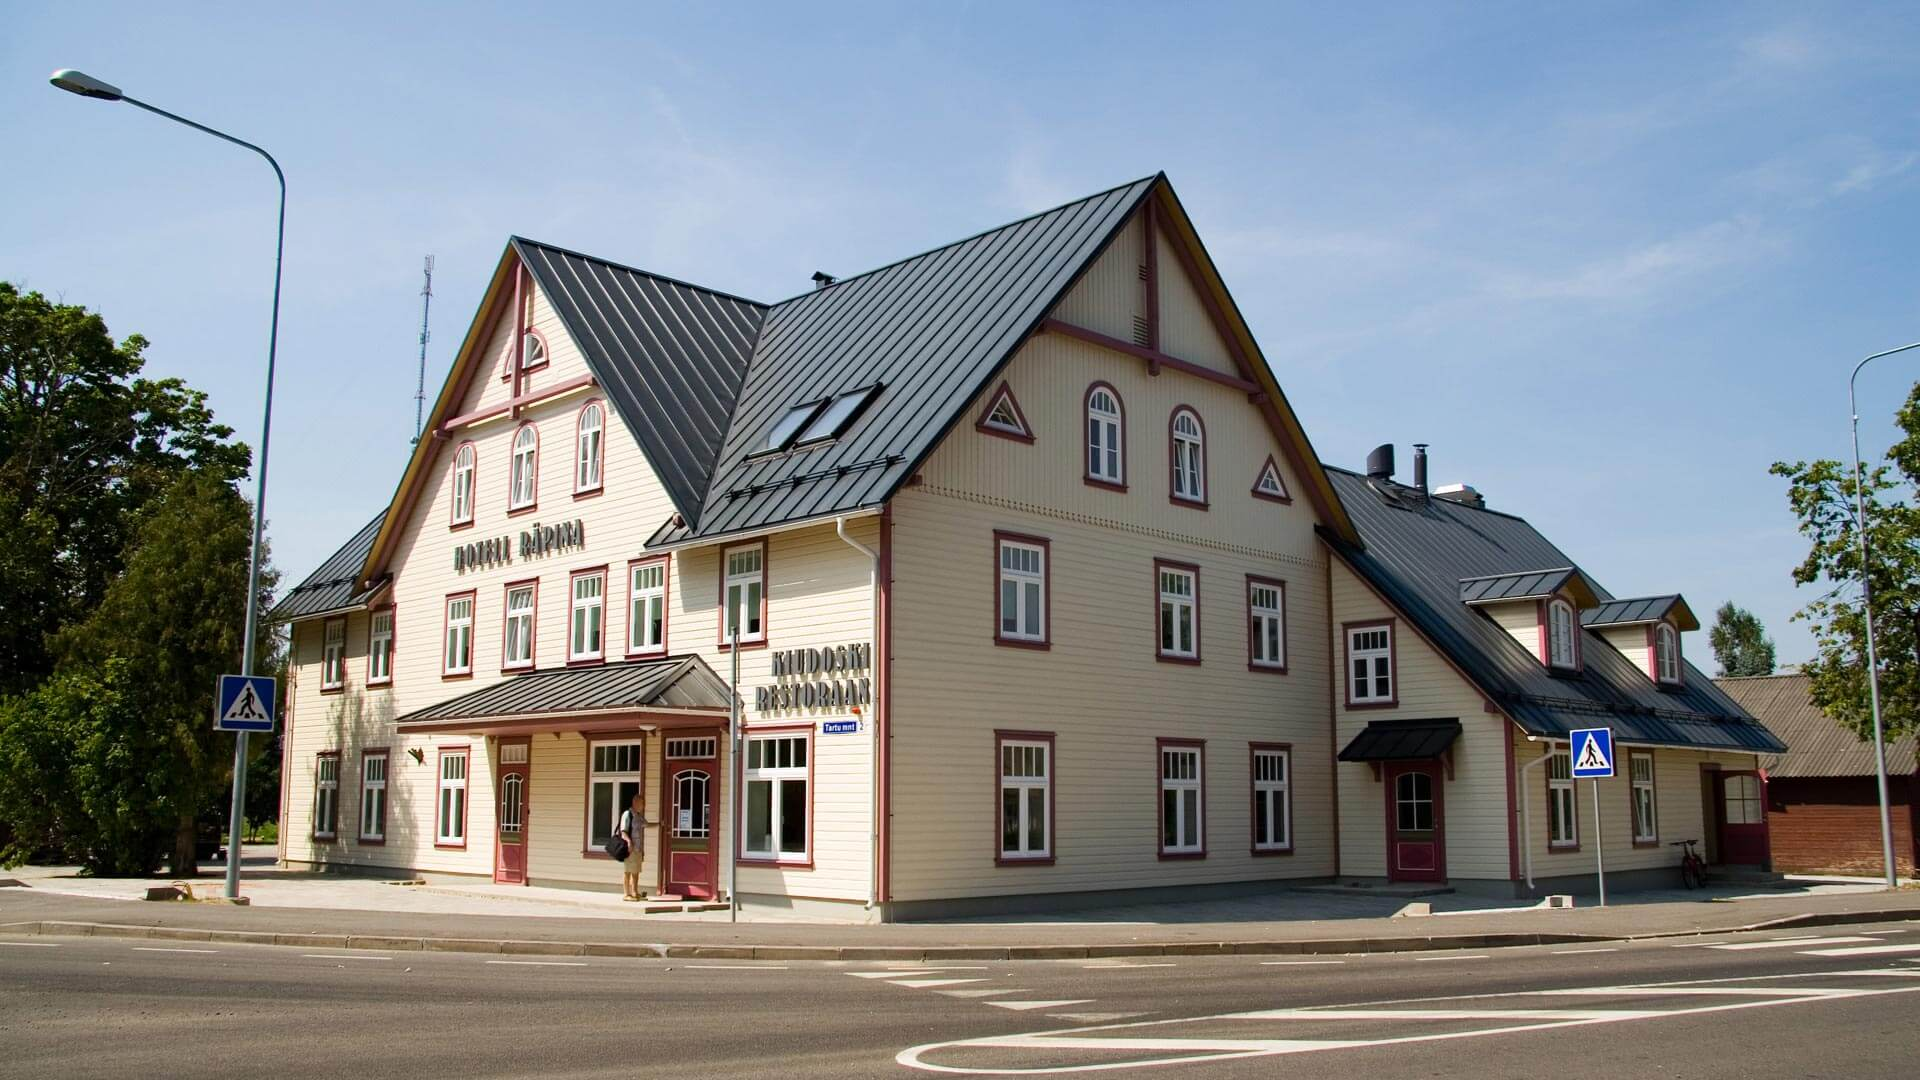 Räpina hotell  Hubane perehotell Räpinas   Kagu-Eesti